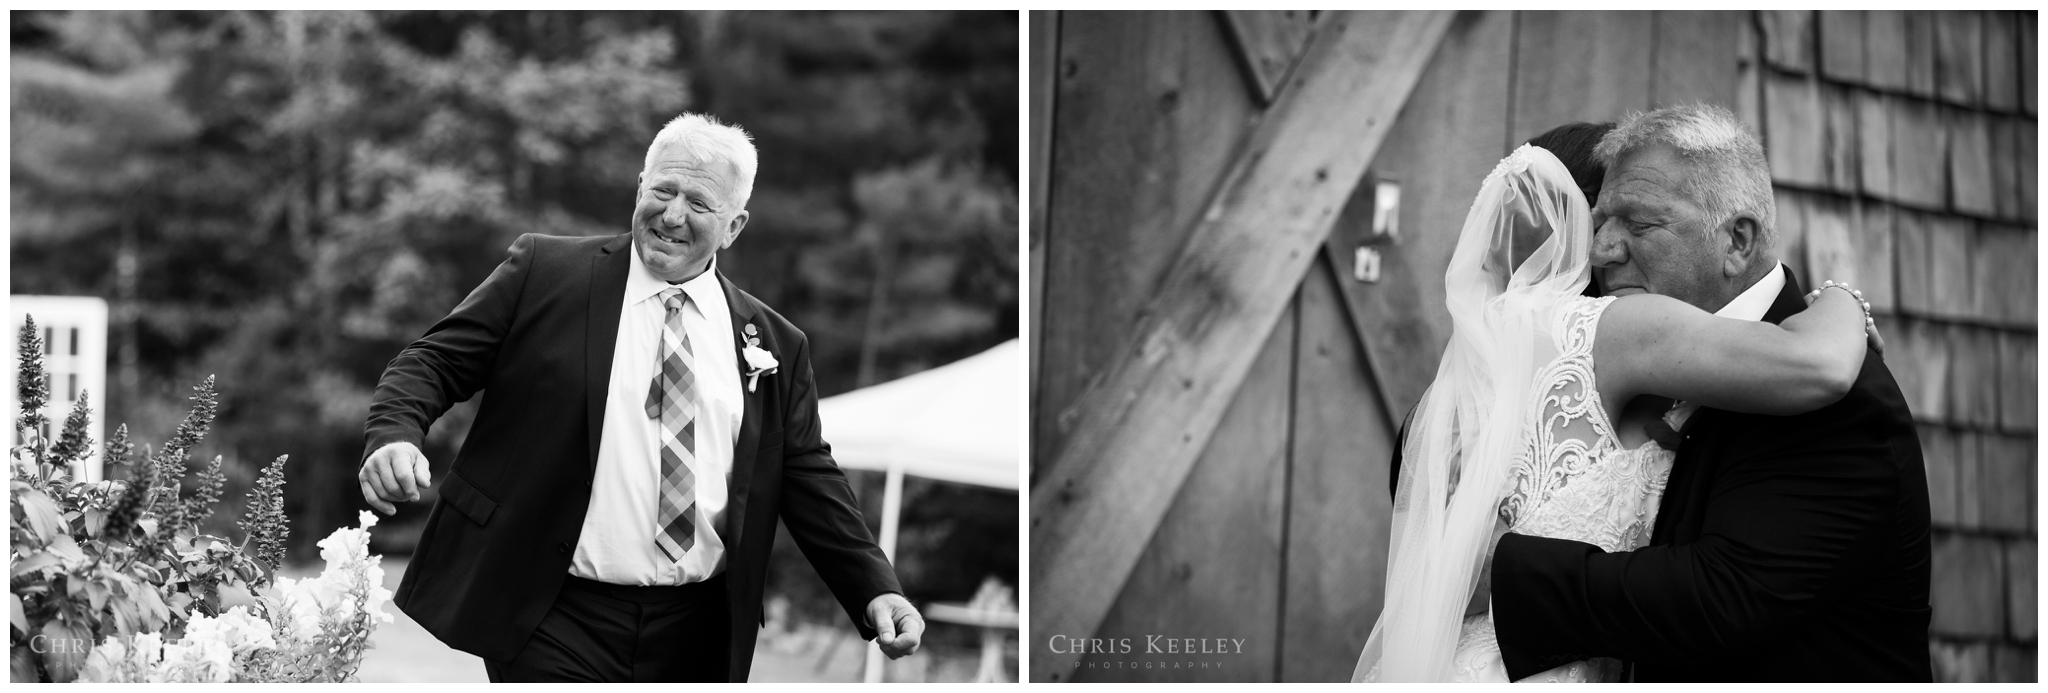 burrows-new-hampshire-wedding-photographer-chris-keeley-13.jpg